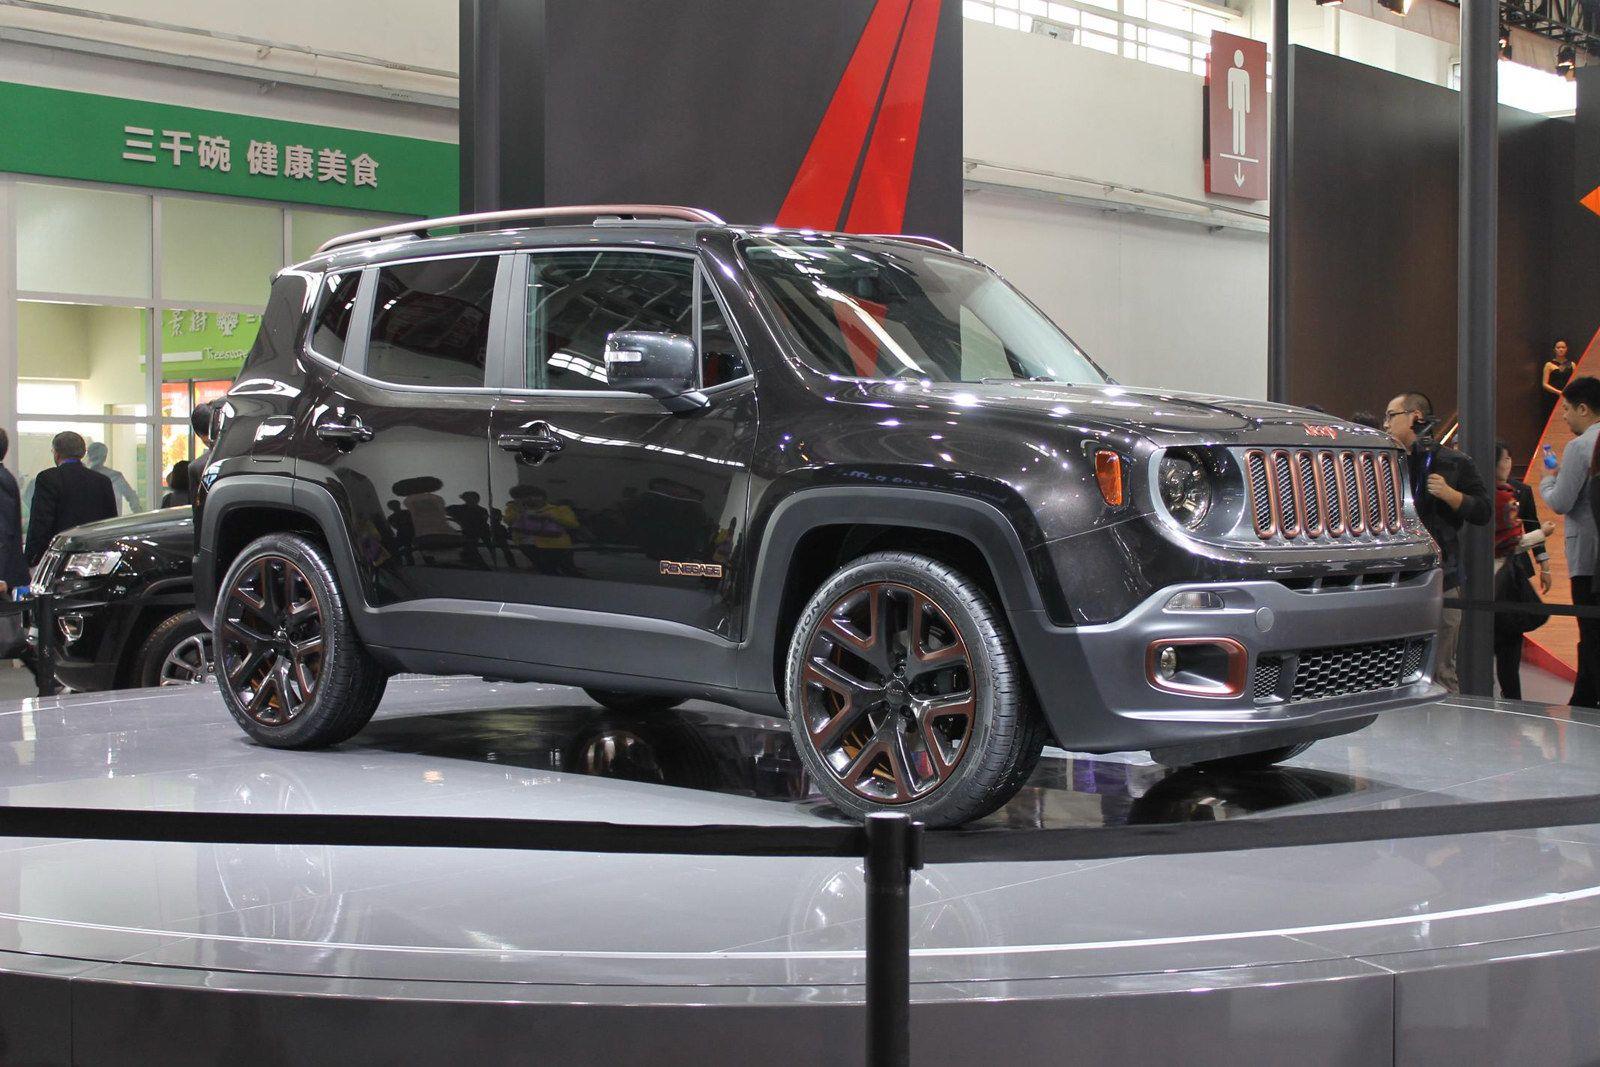 2015 Jeep Renegade Black Desktop Wallpaper 52691 Designpicky Com Jeep Renegade 2015 Jeep Renegade Jeep